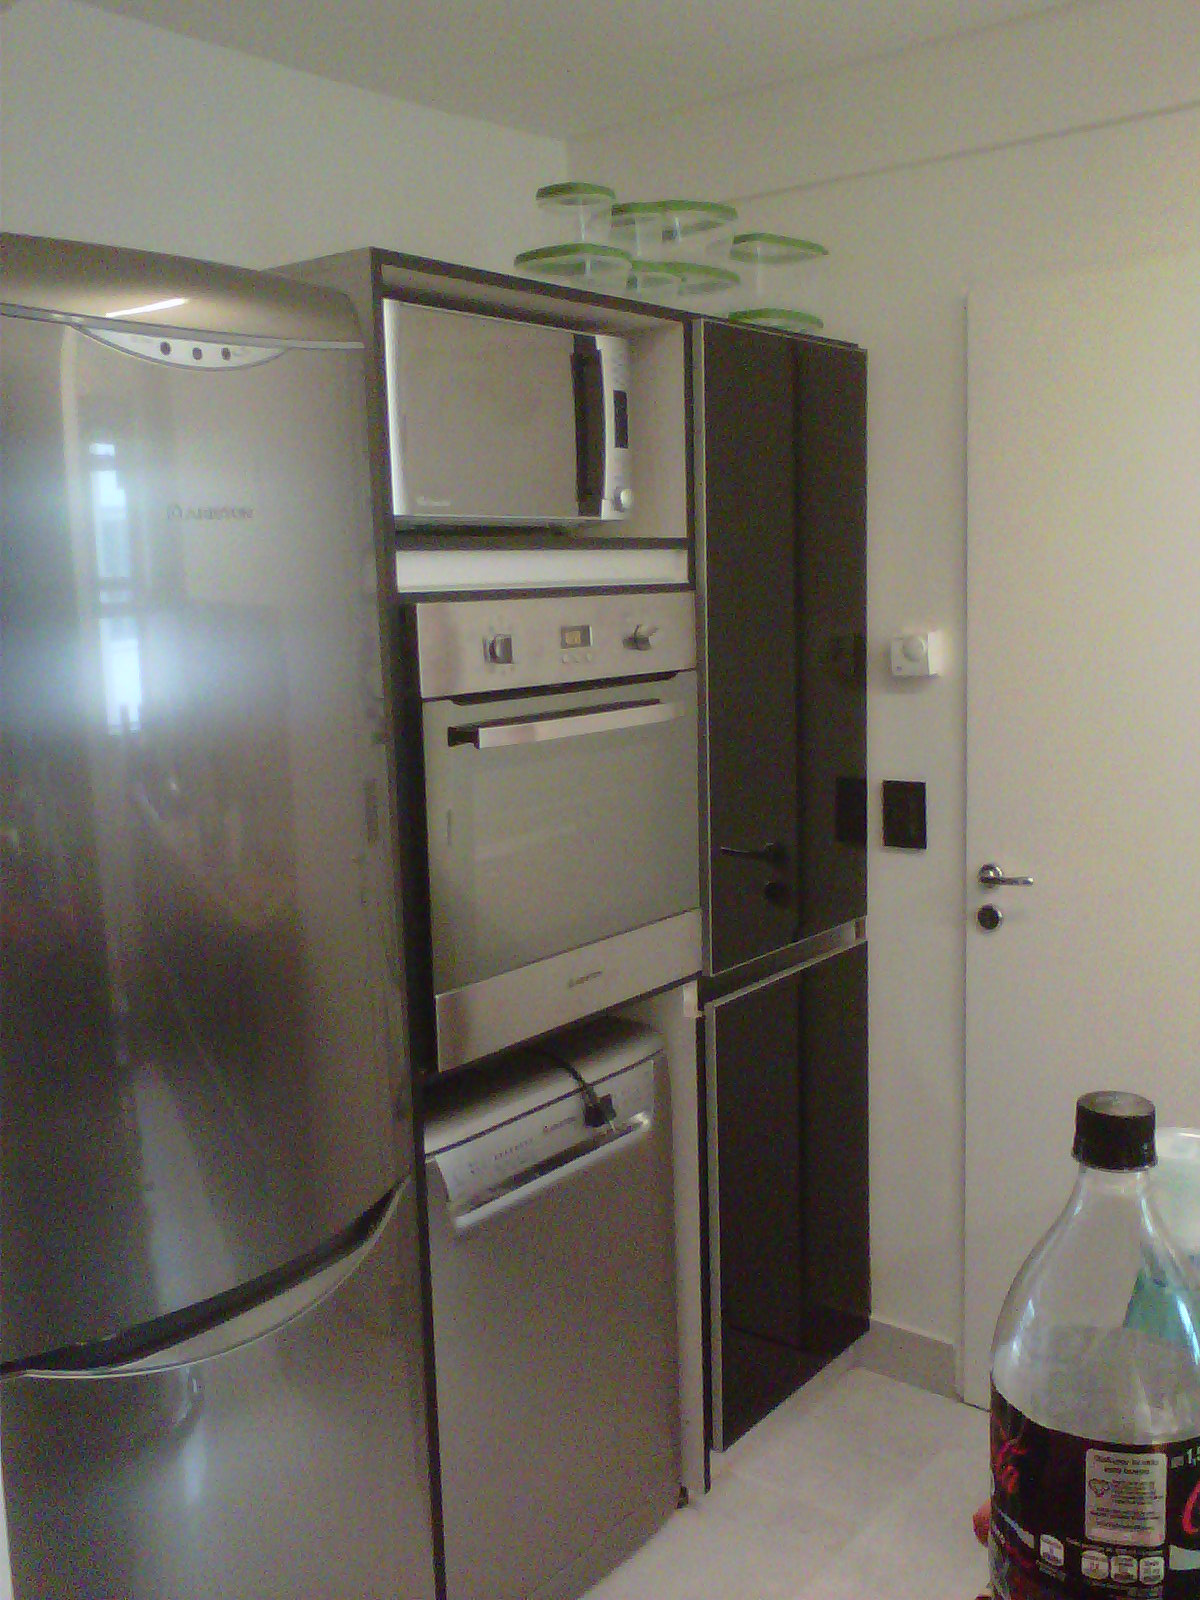 Muebles de cocina comedor living ba o dormitorio for Muebles para cocina comedor